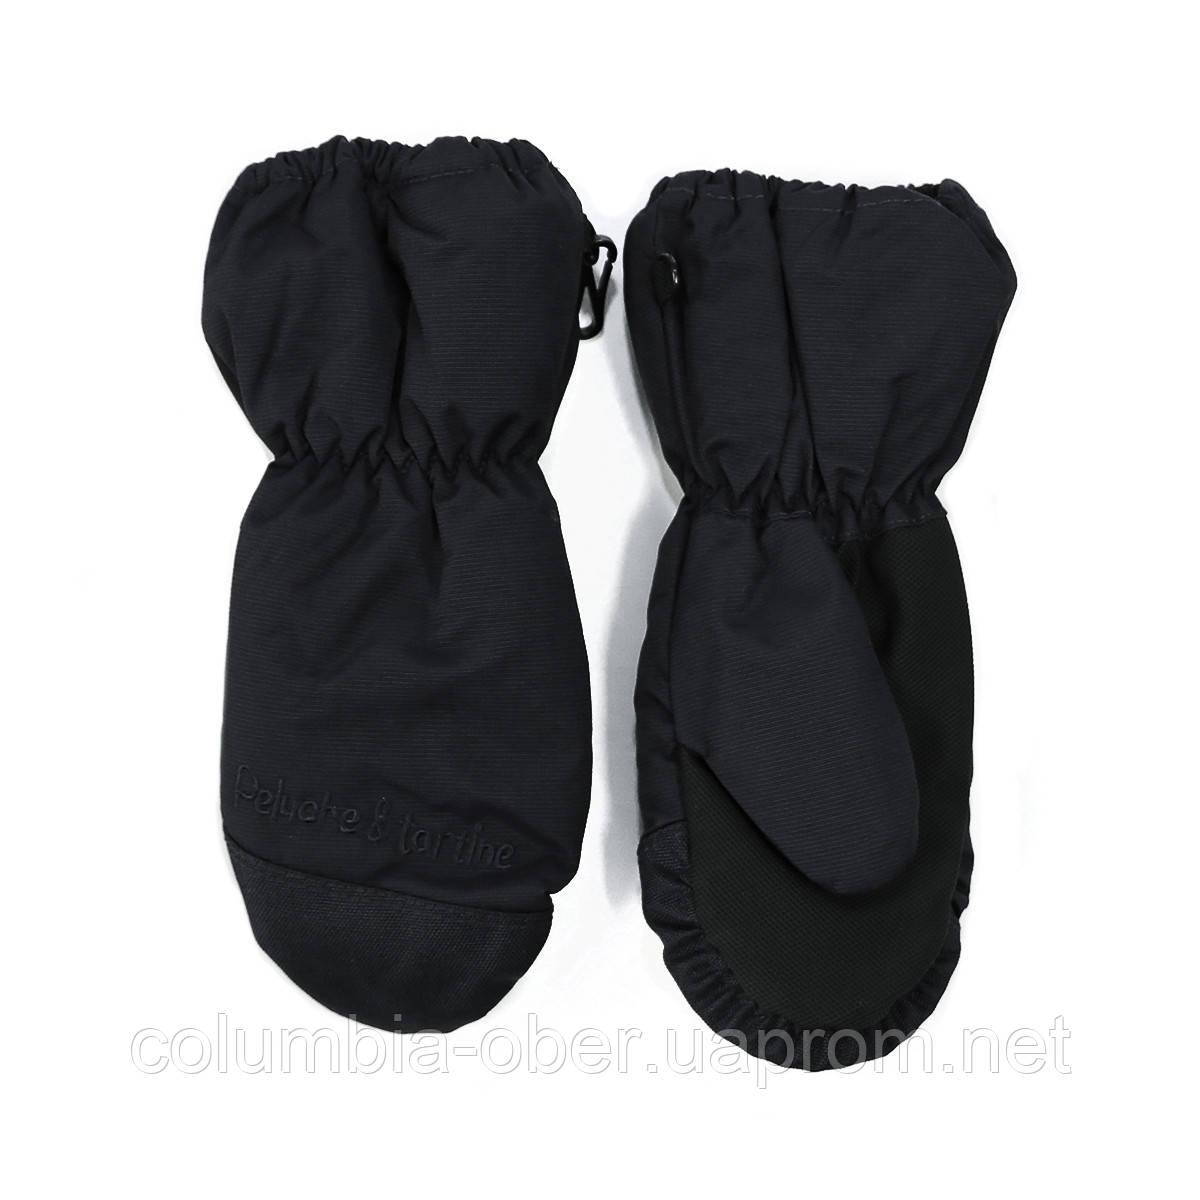 Зимние рукавицы - краги для мальчика Peluche&Tartine 58 EF MIT F16 Black. Размер 3/4 -  7/8.